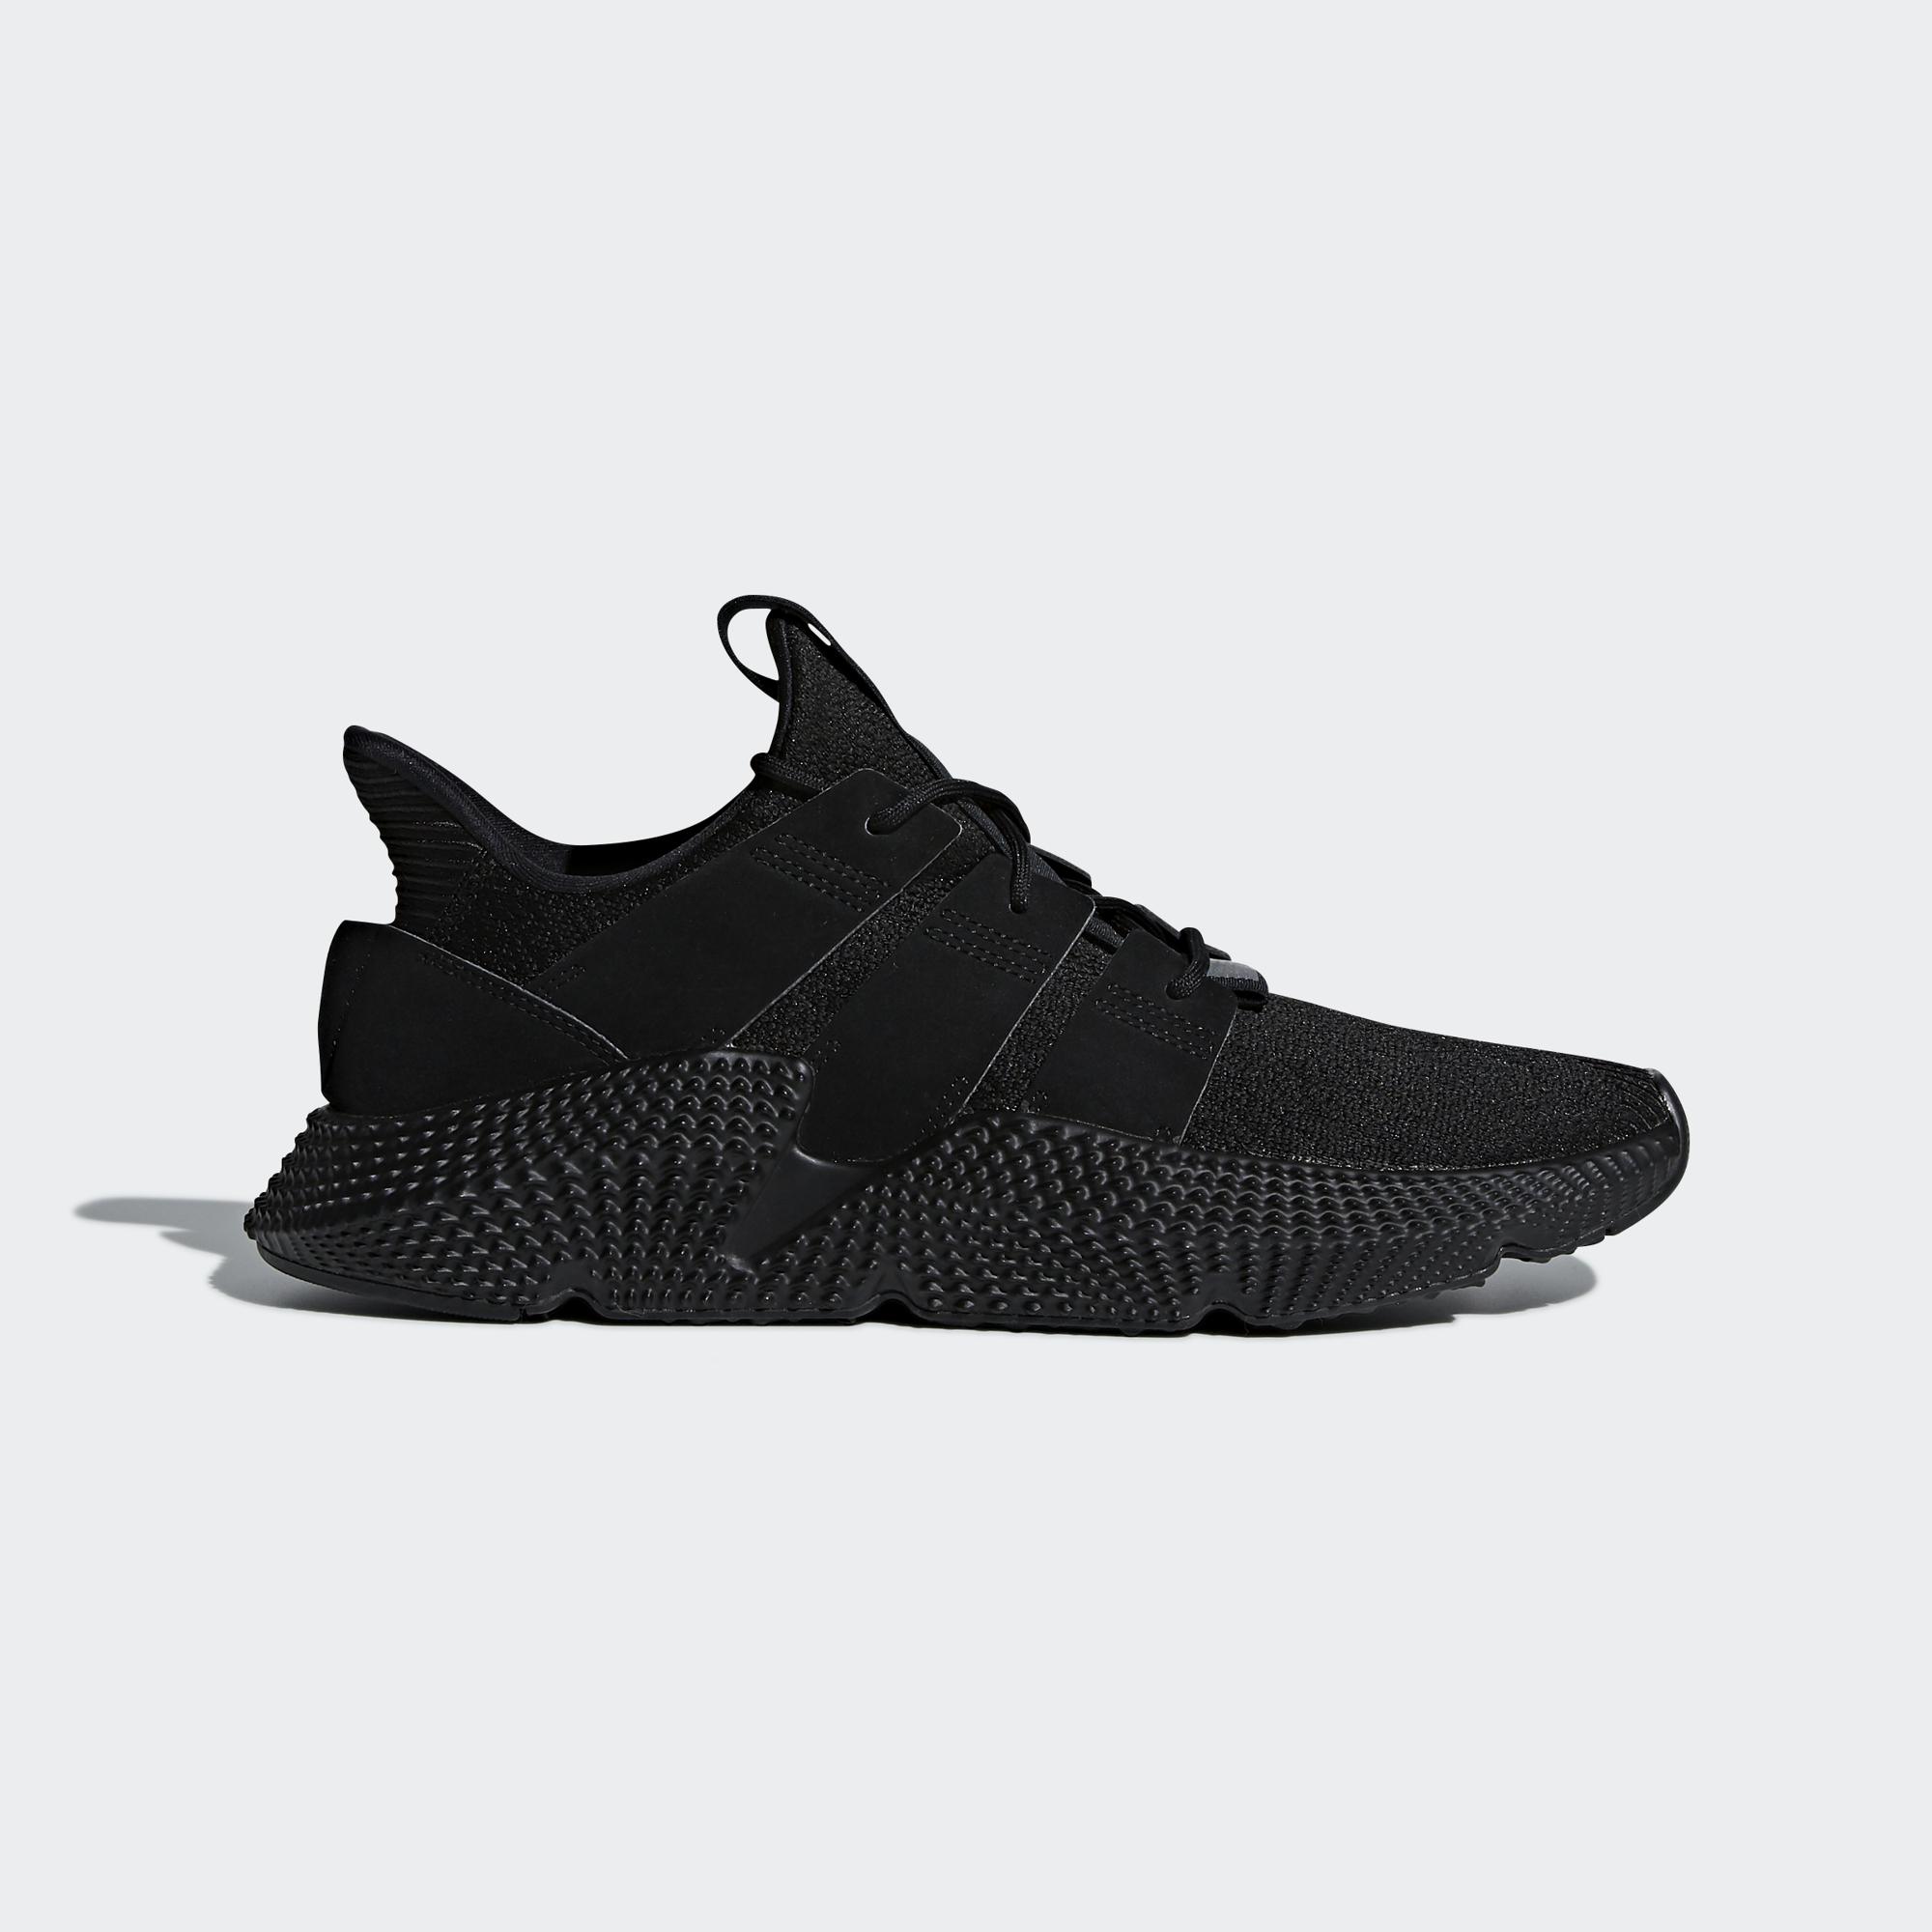 97258d687a71 Obuv Adidas Originals Prophere B37453 - Teniskovo.online